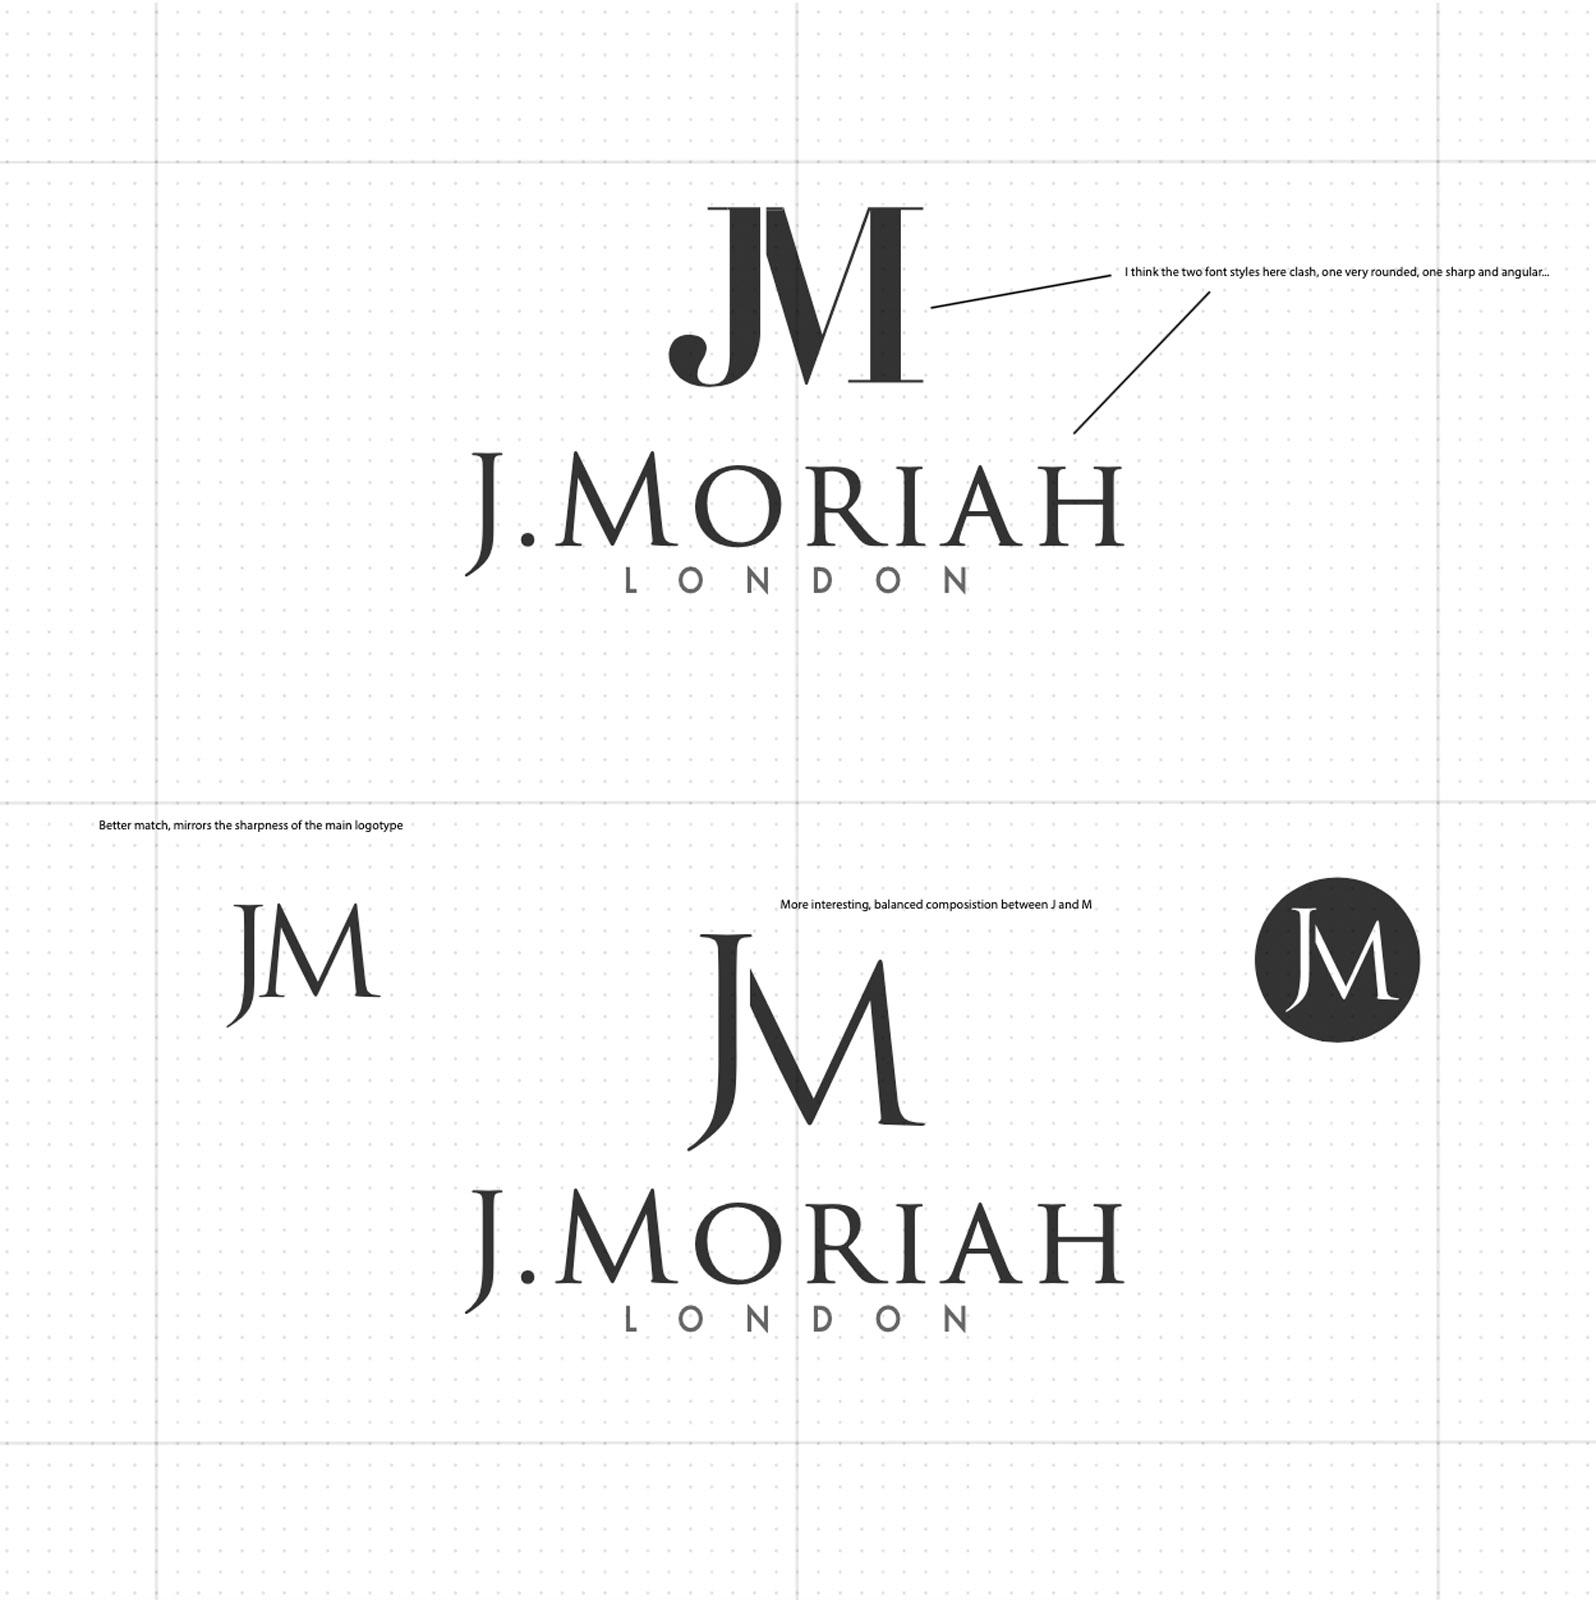 luxury-fashion-brand-logo-design-london07